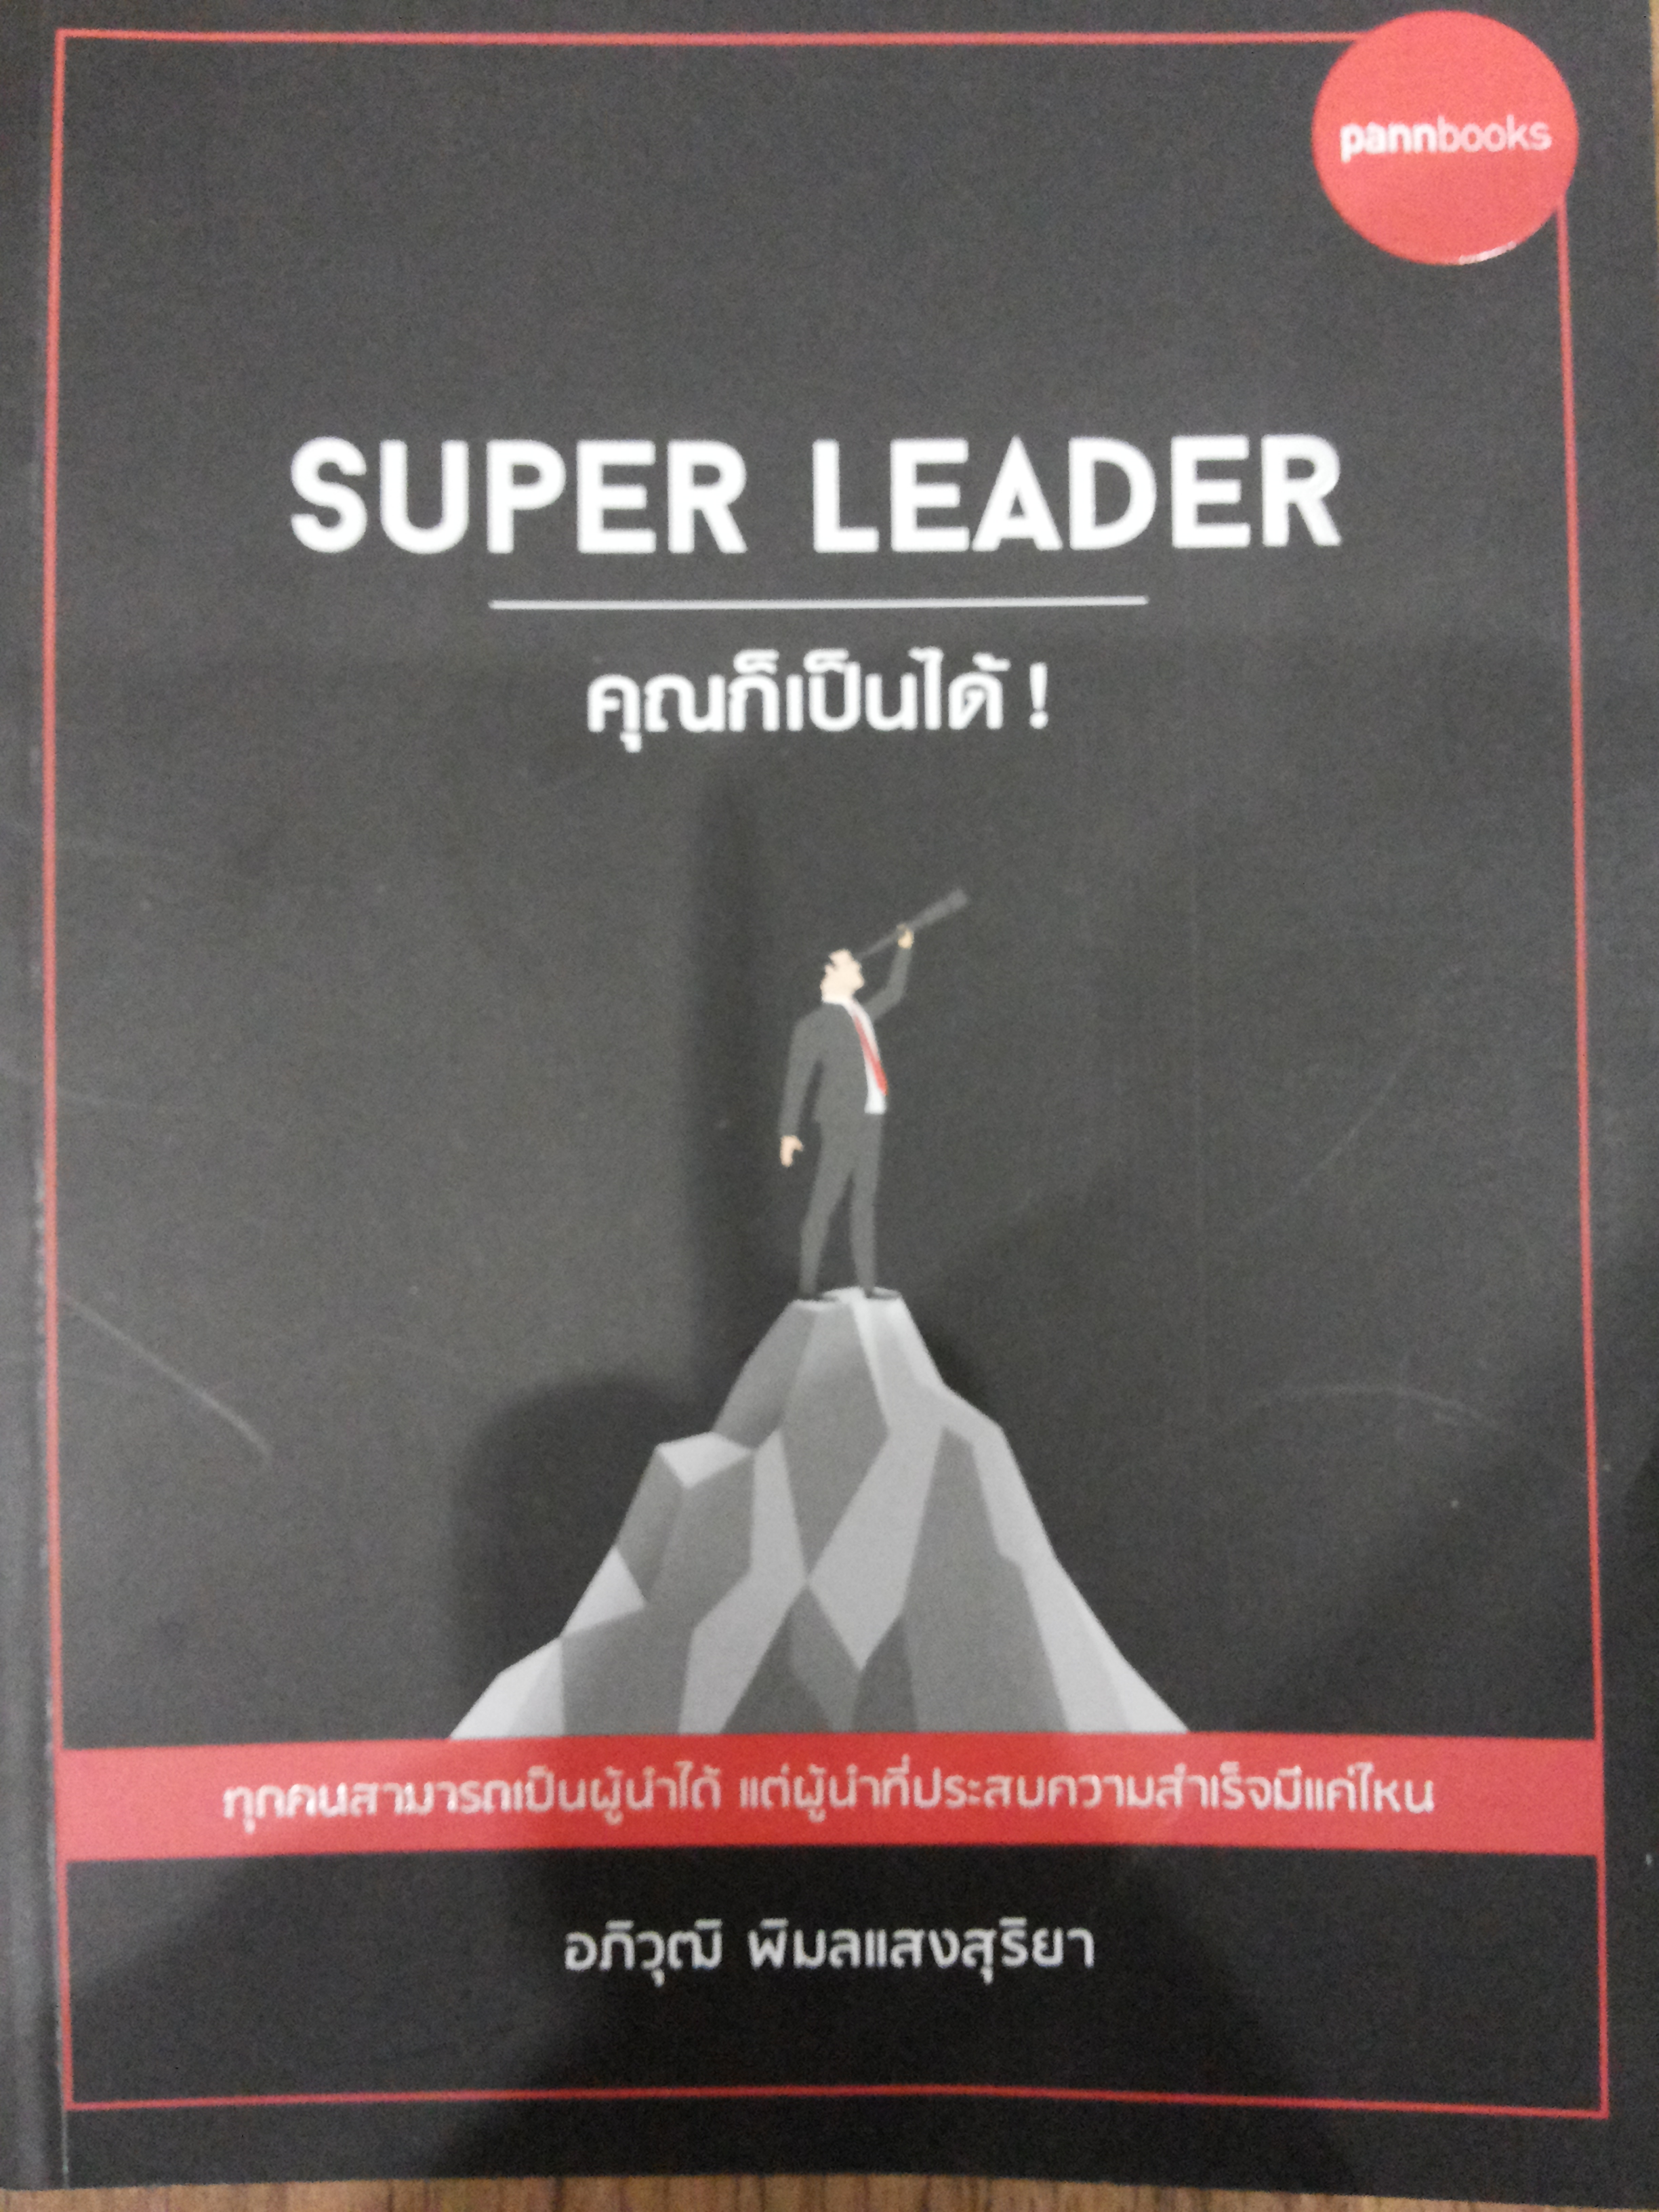 SUPER LEADER คุณก็เป็นได้